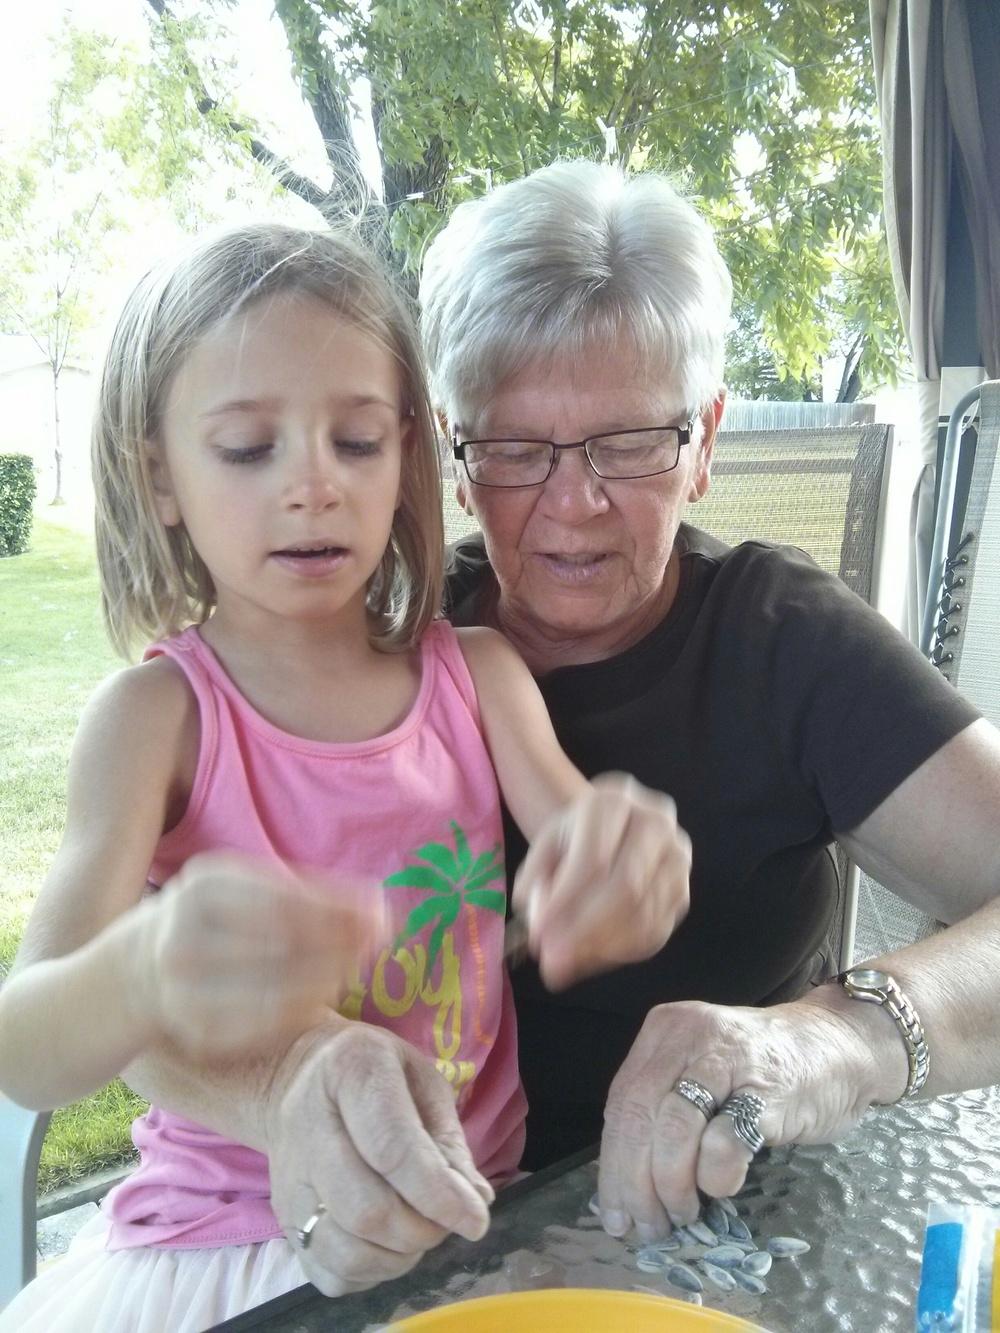 Enjoying sunflower seeds with Grandma G.